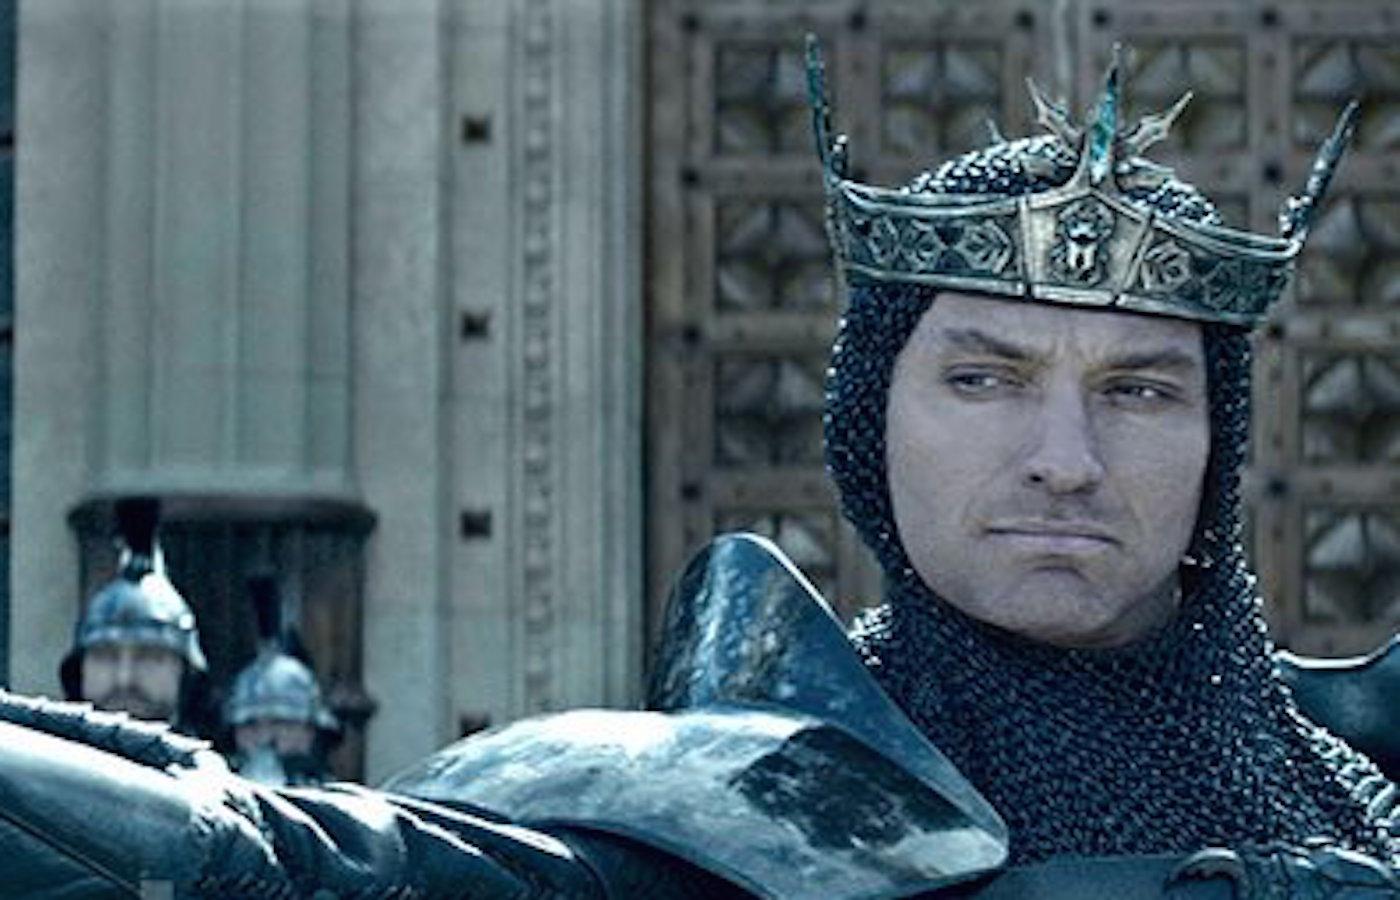 King arthur legend of the sword jude law